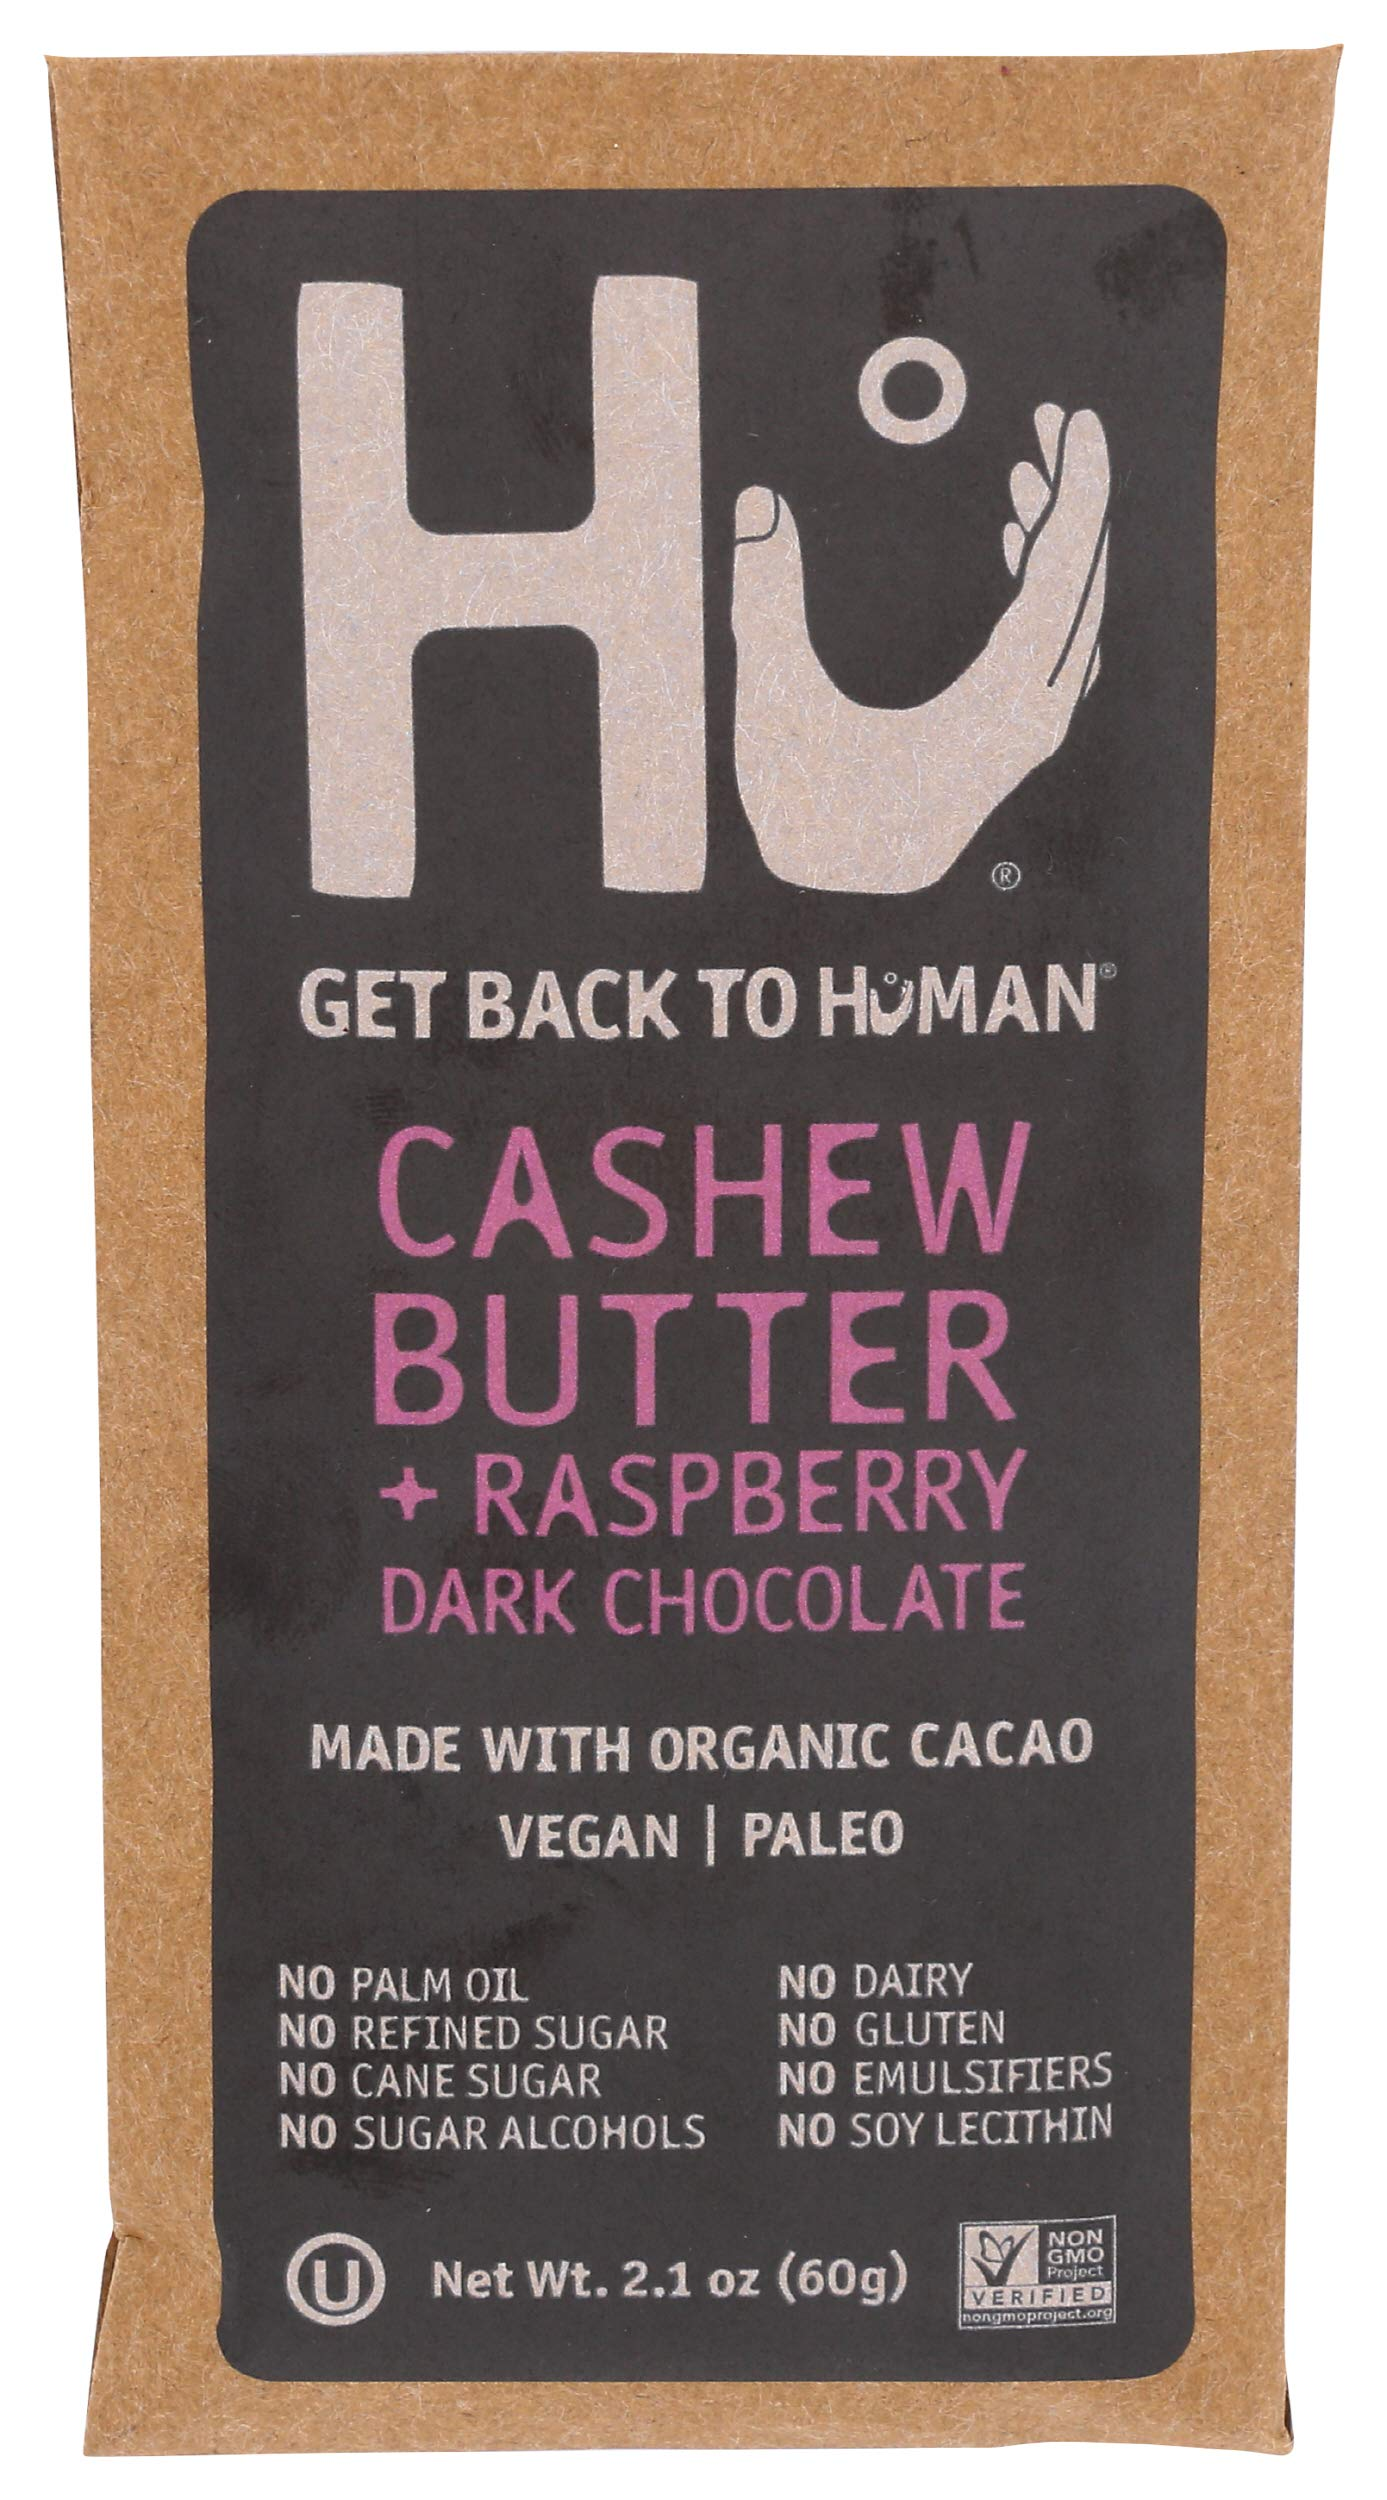 HU KITCHEN Raspberry Cashew Butter Chocolate Bar, 2.1 OZ